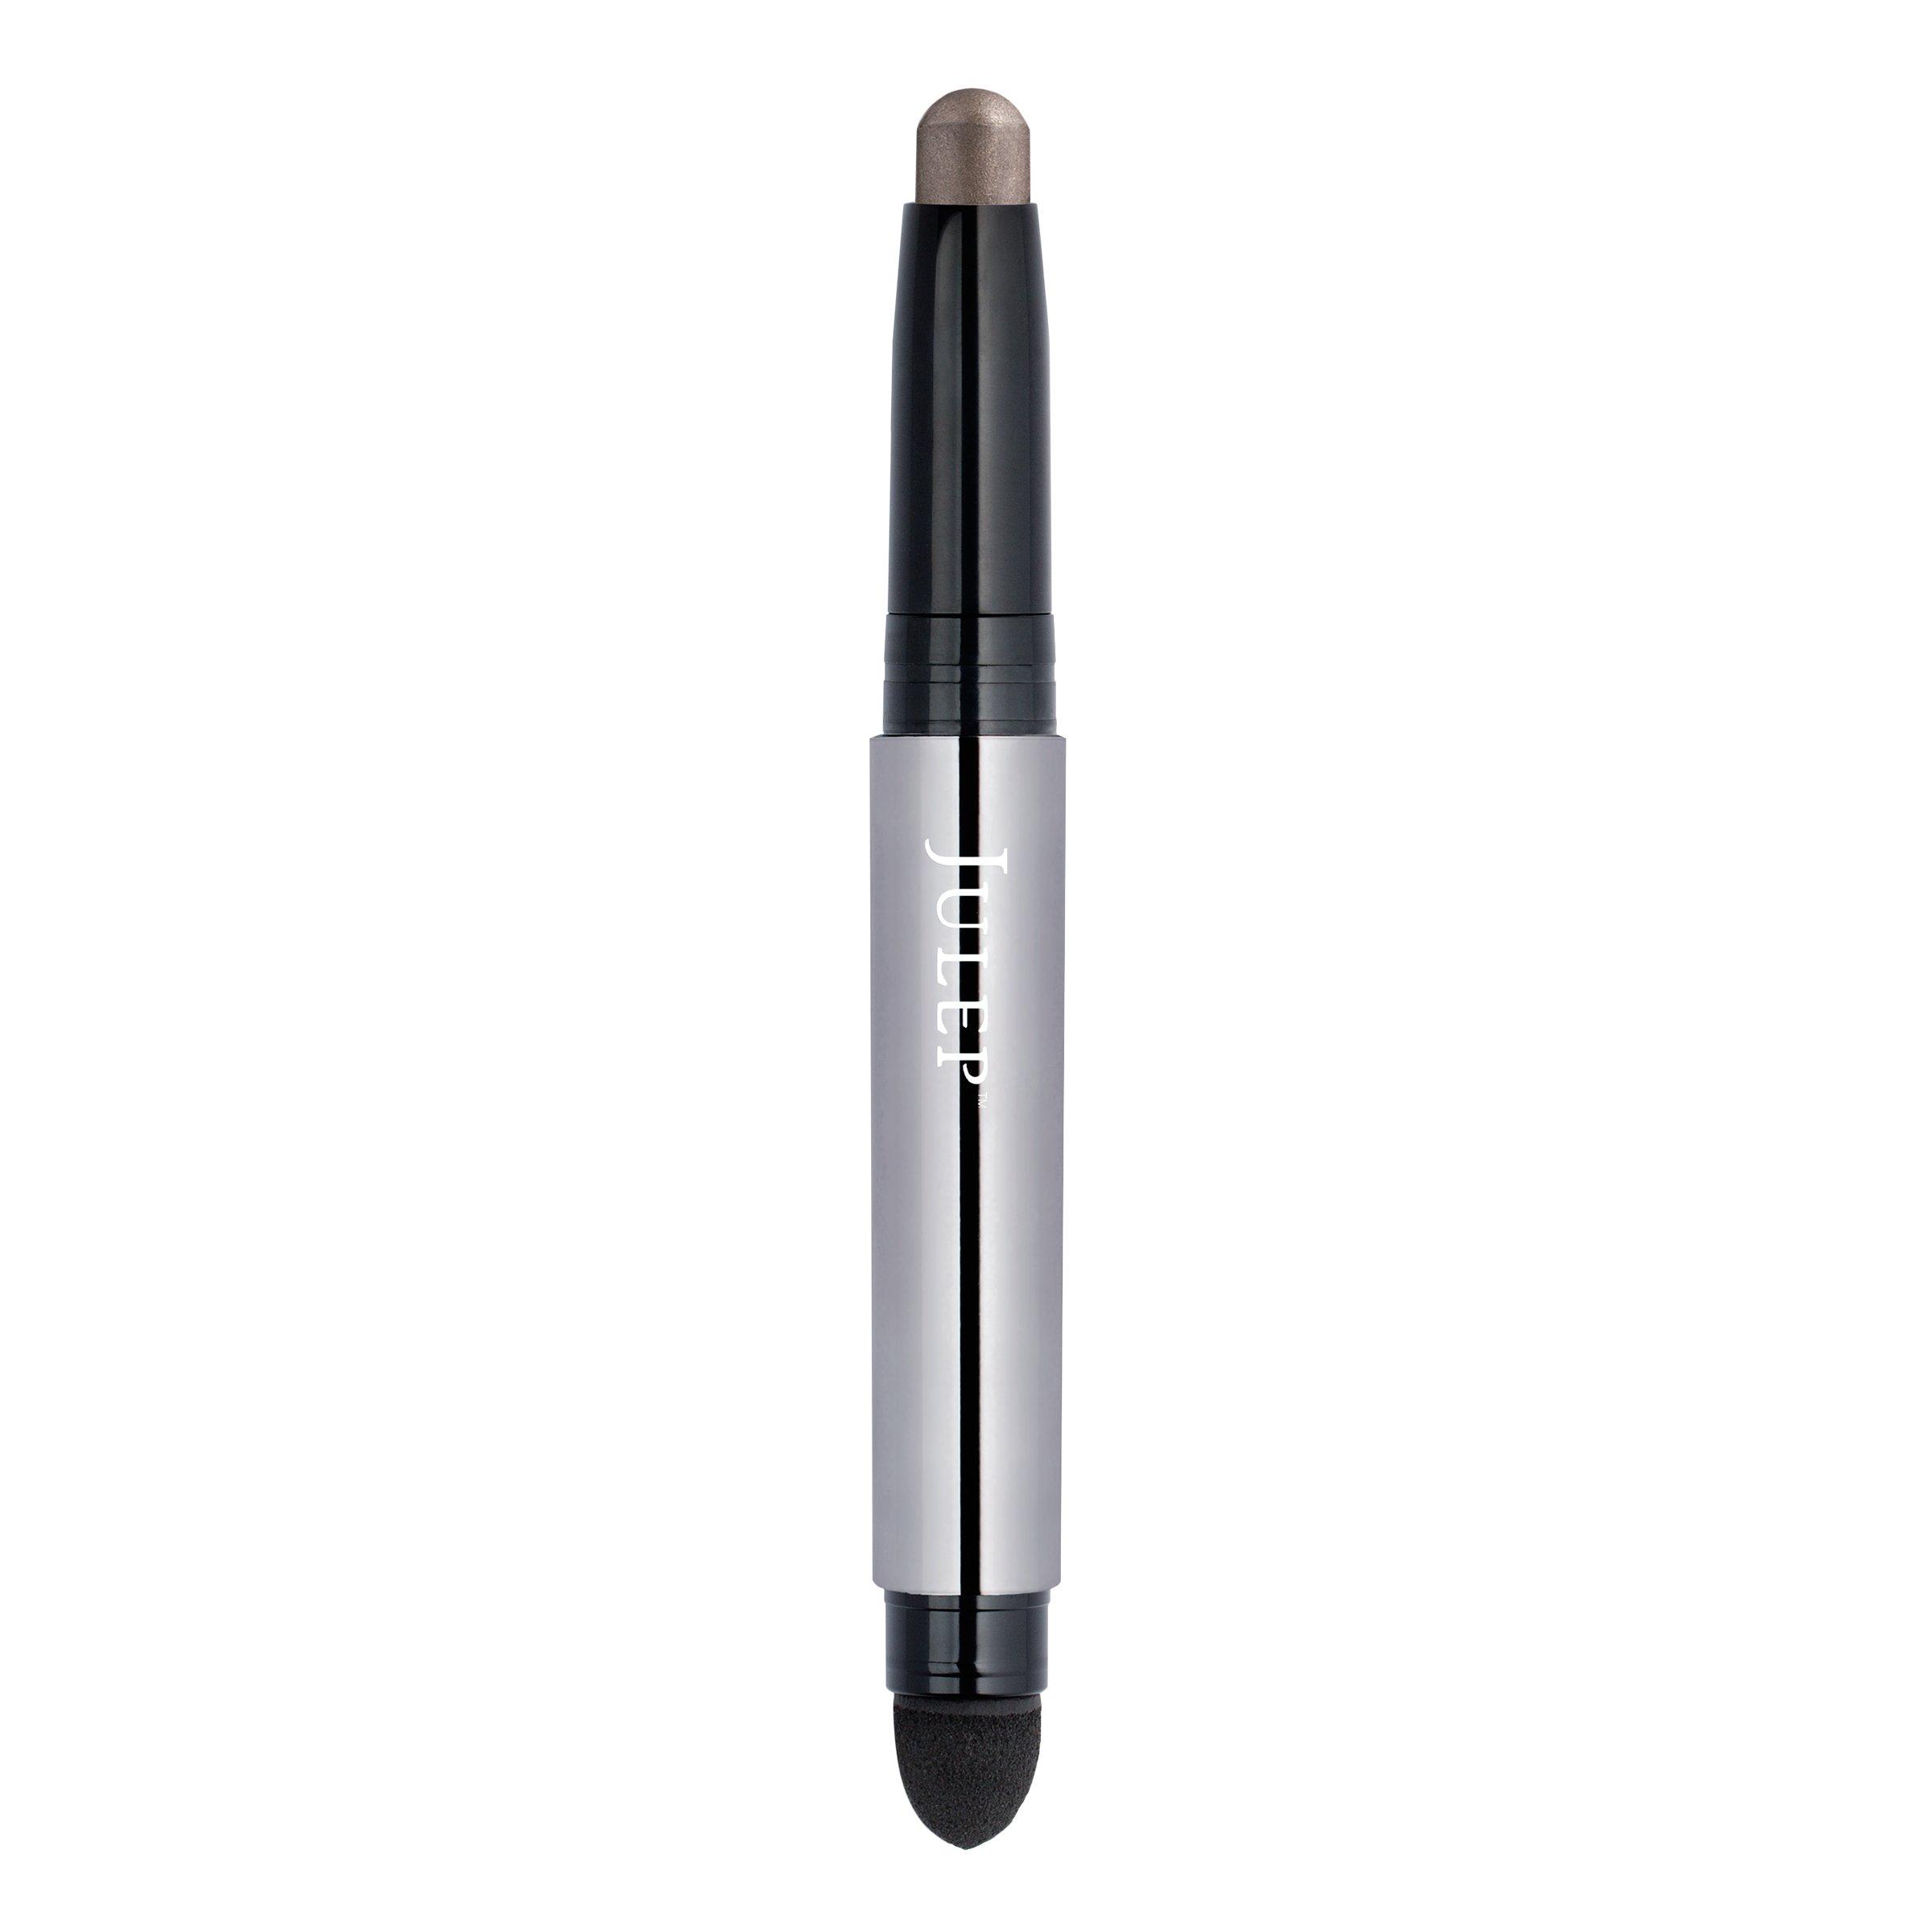 Julep Eyeshadow 101 Crème to Powder Waterproof Eyeshadow Stick, Taupe Shimmer